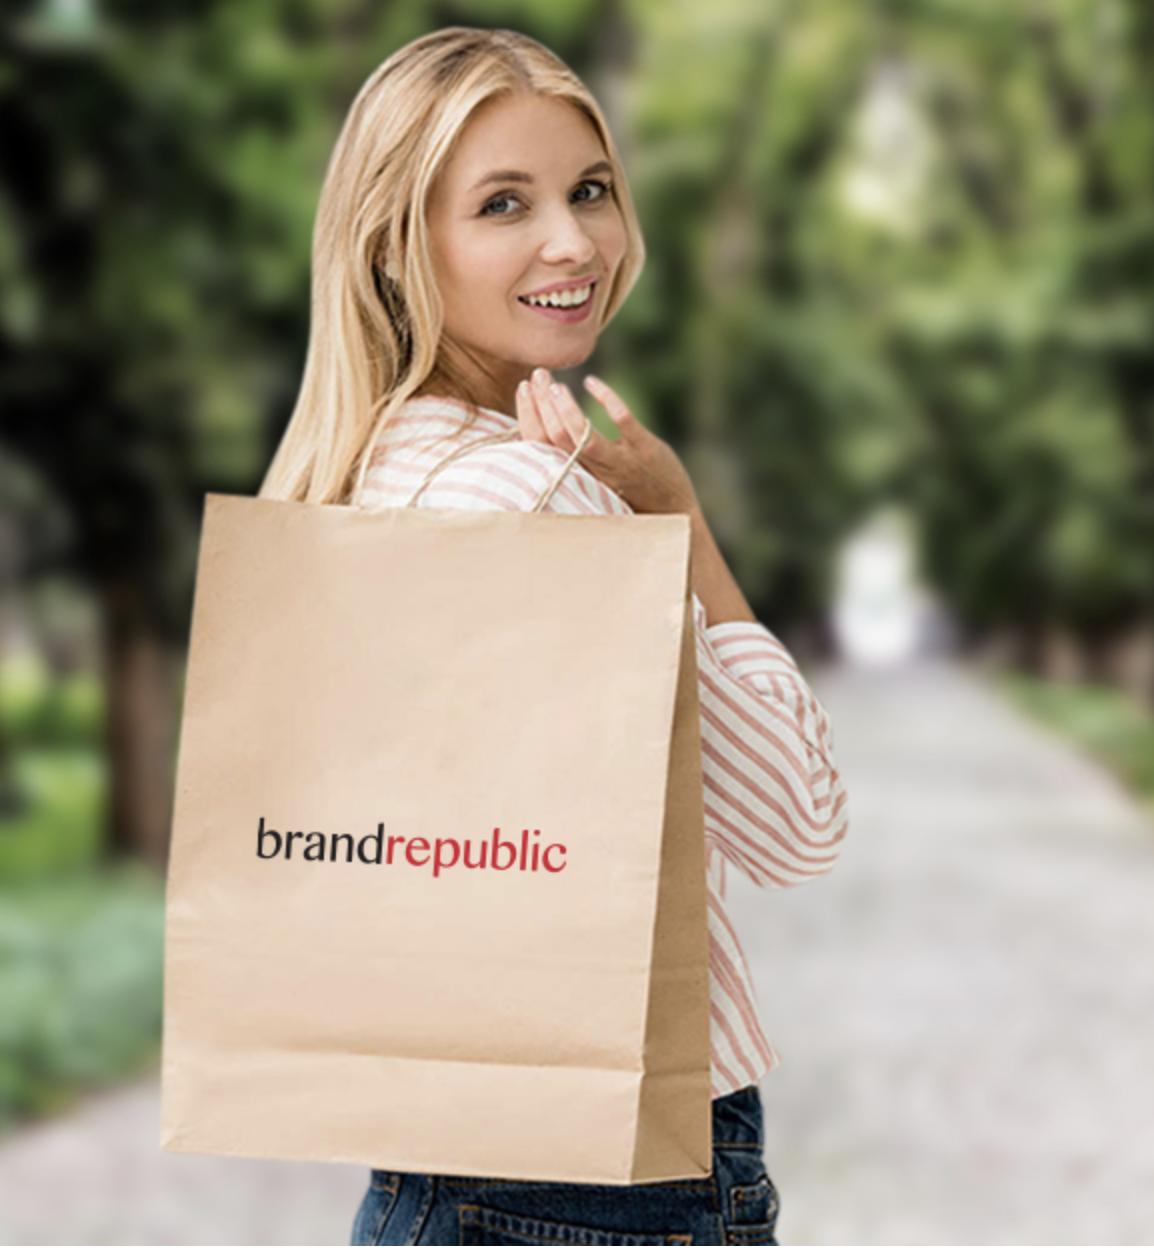 Plastic Bags Ban Pushes Businesses Towards Printed Paper Bags